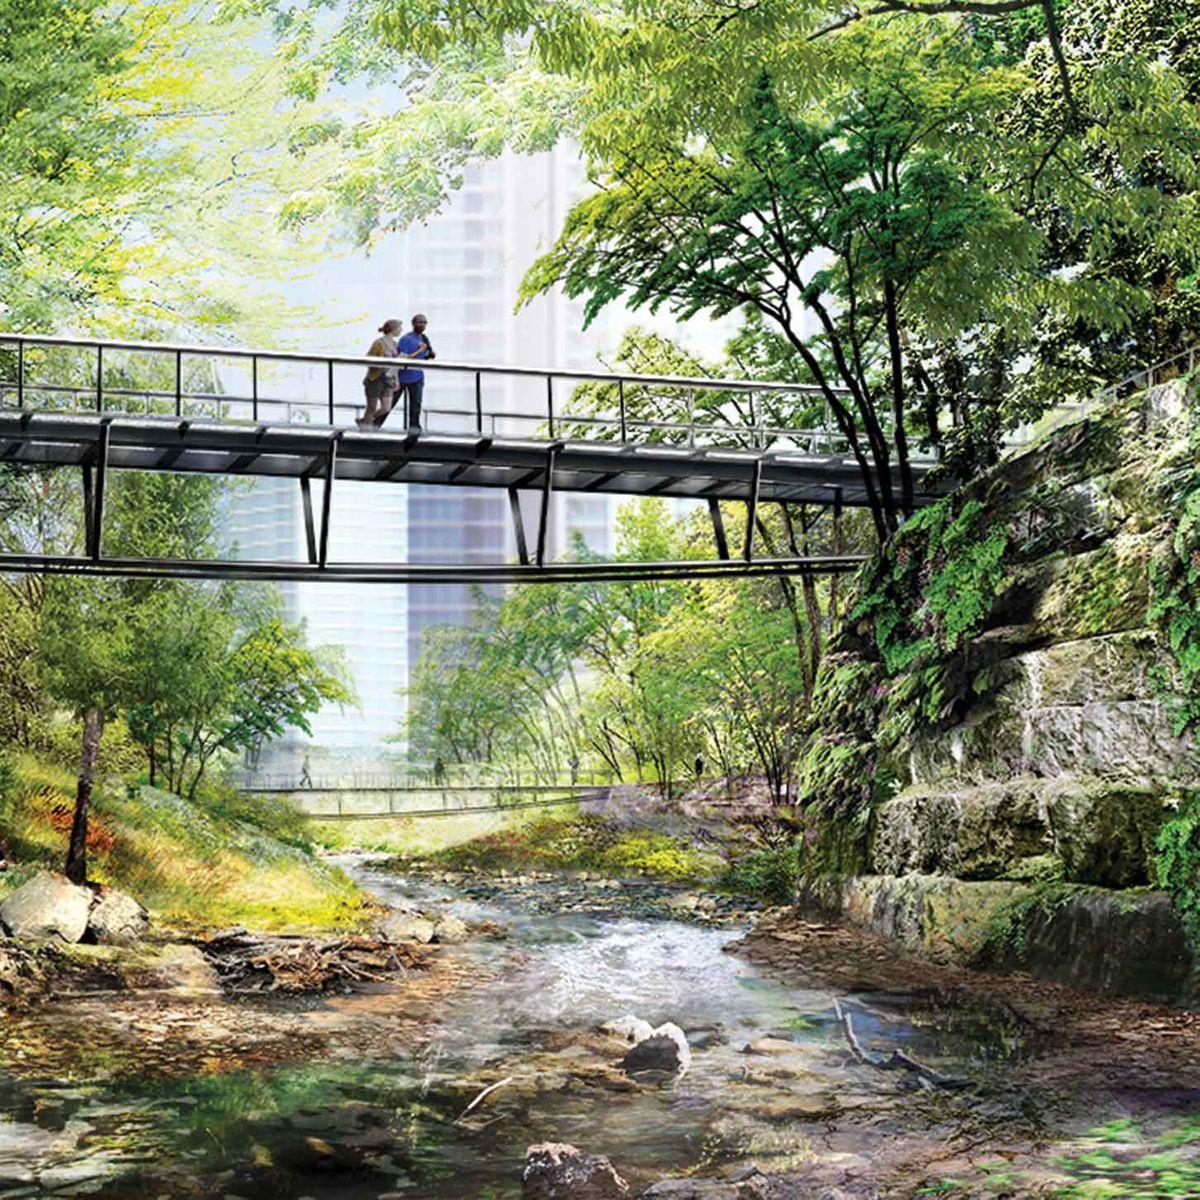 Waller Creek Riverwalk